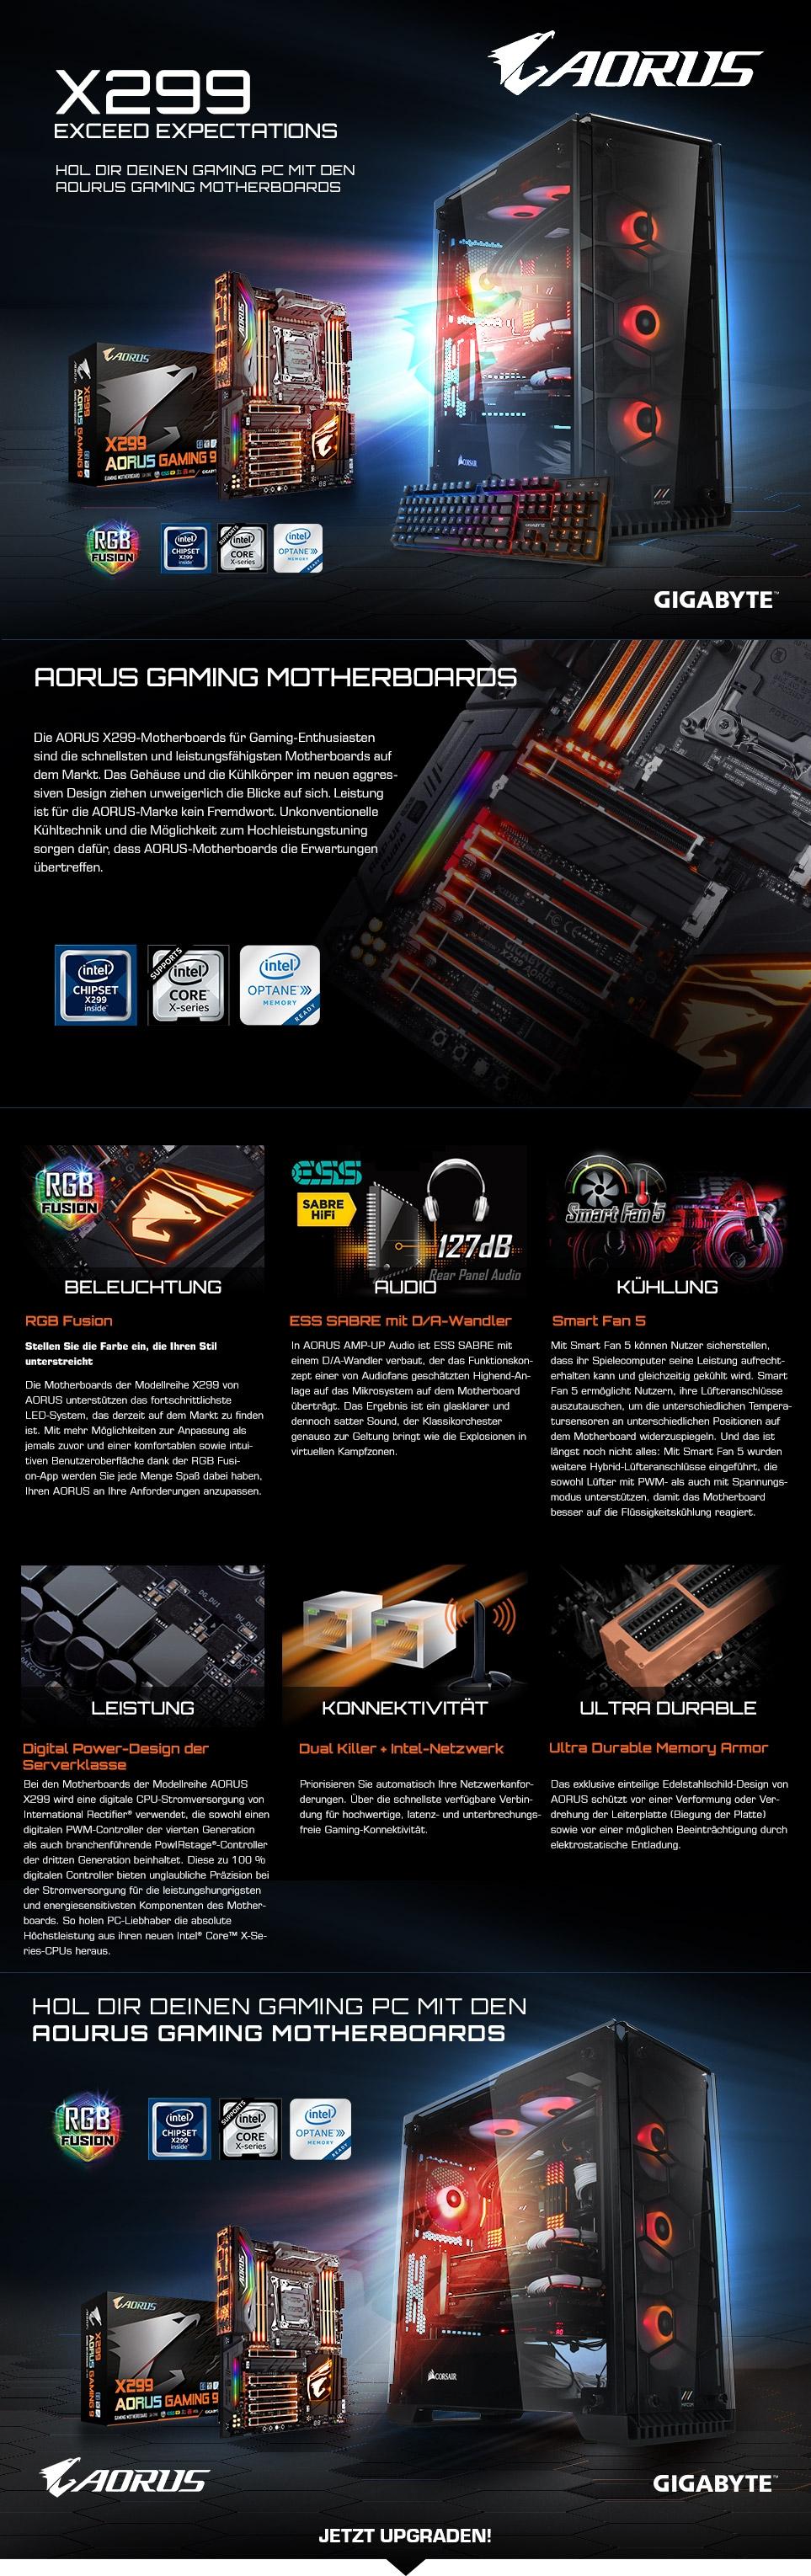 Hol Dir deinen Gaming PC mit den Gigabyte Aorus Gaming Motherboards